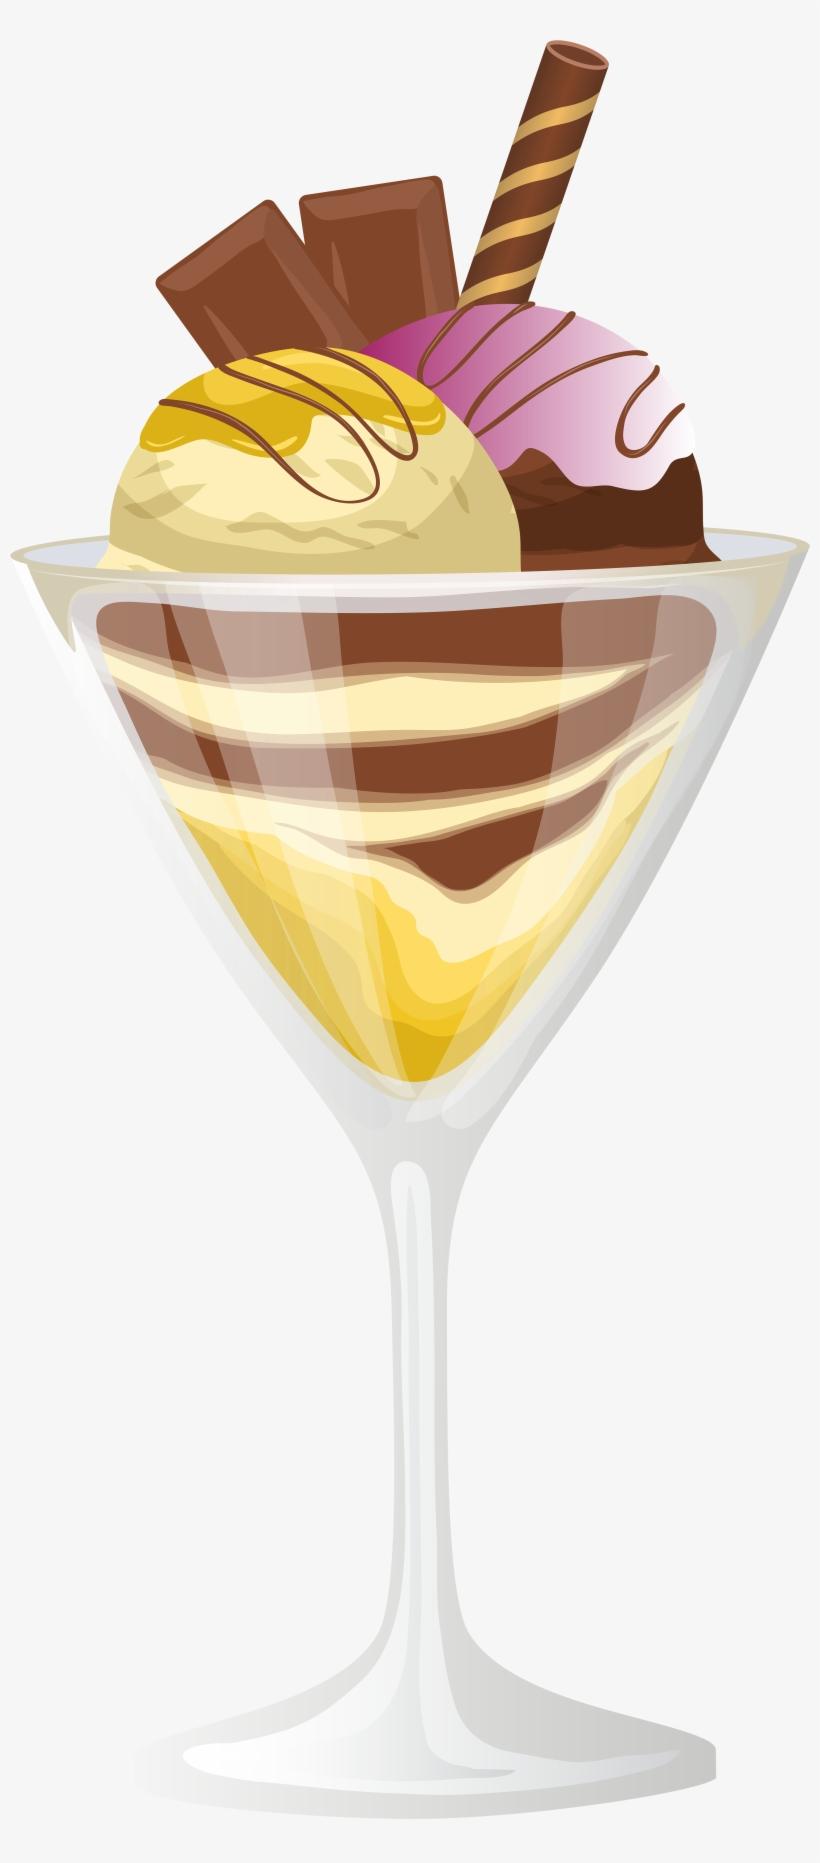 Ice Cream Sundae Png Clip Art - Ice Cream Sundae Png, transparent png #245311